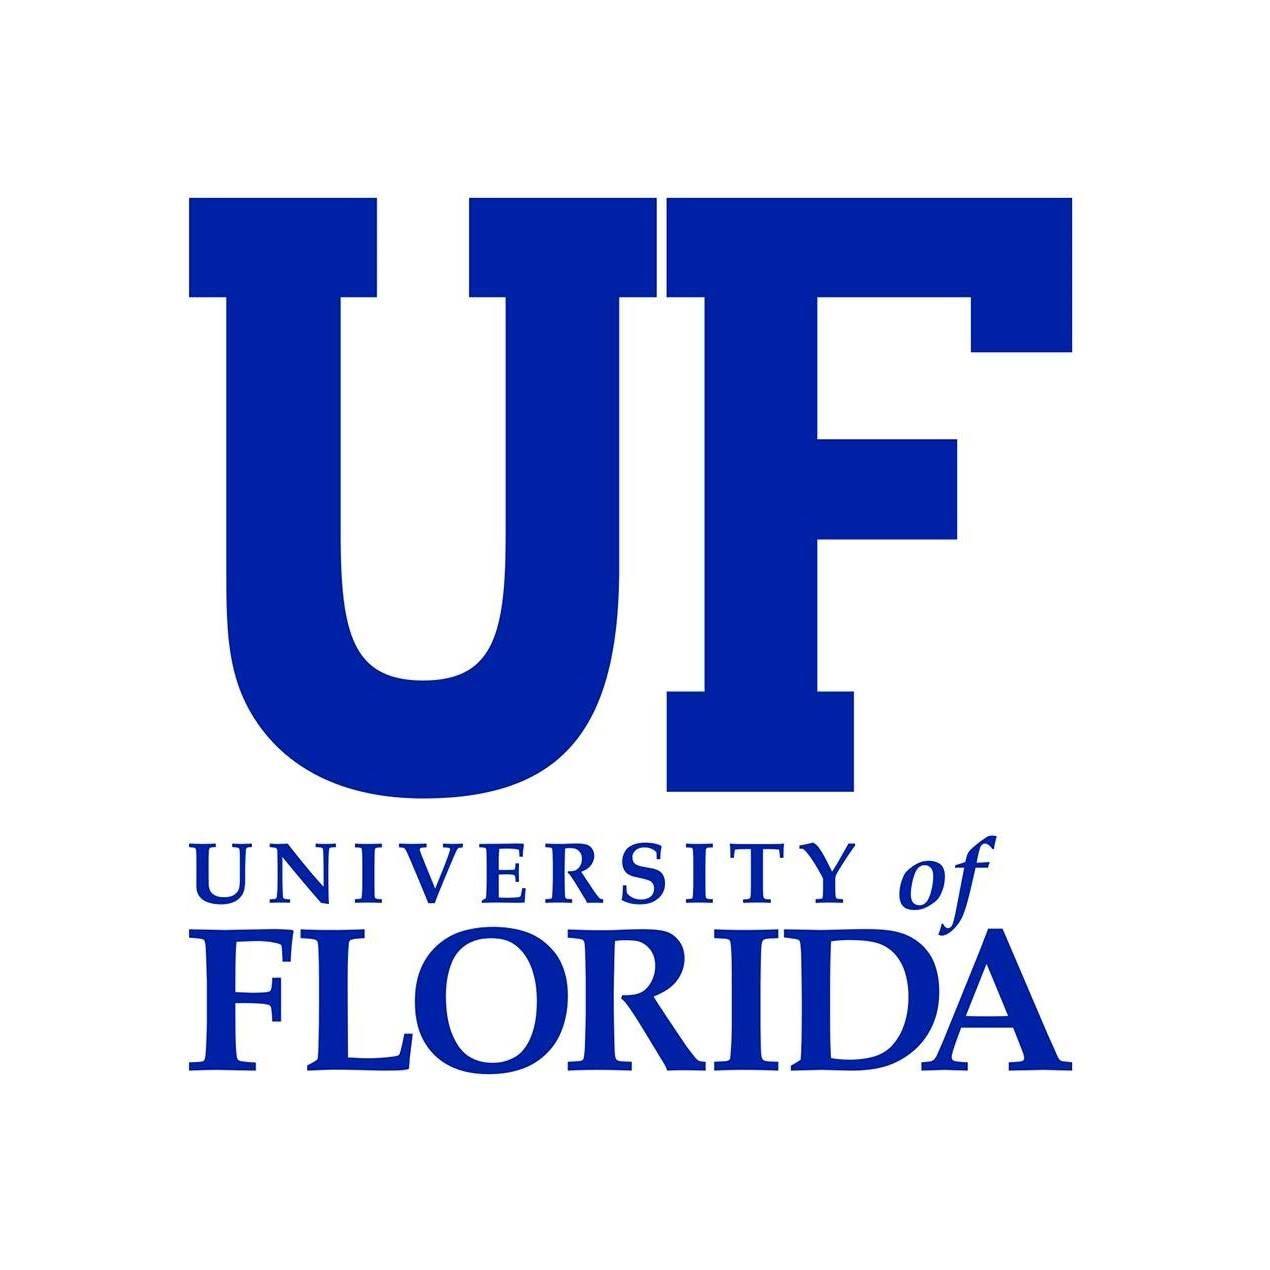 Uf 2022 Summer Calendar.League Of Environmental Educators In Florida Uf Grants And Funding